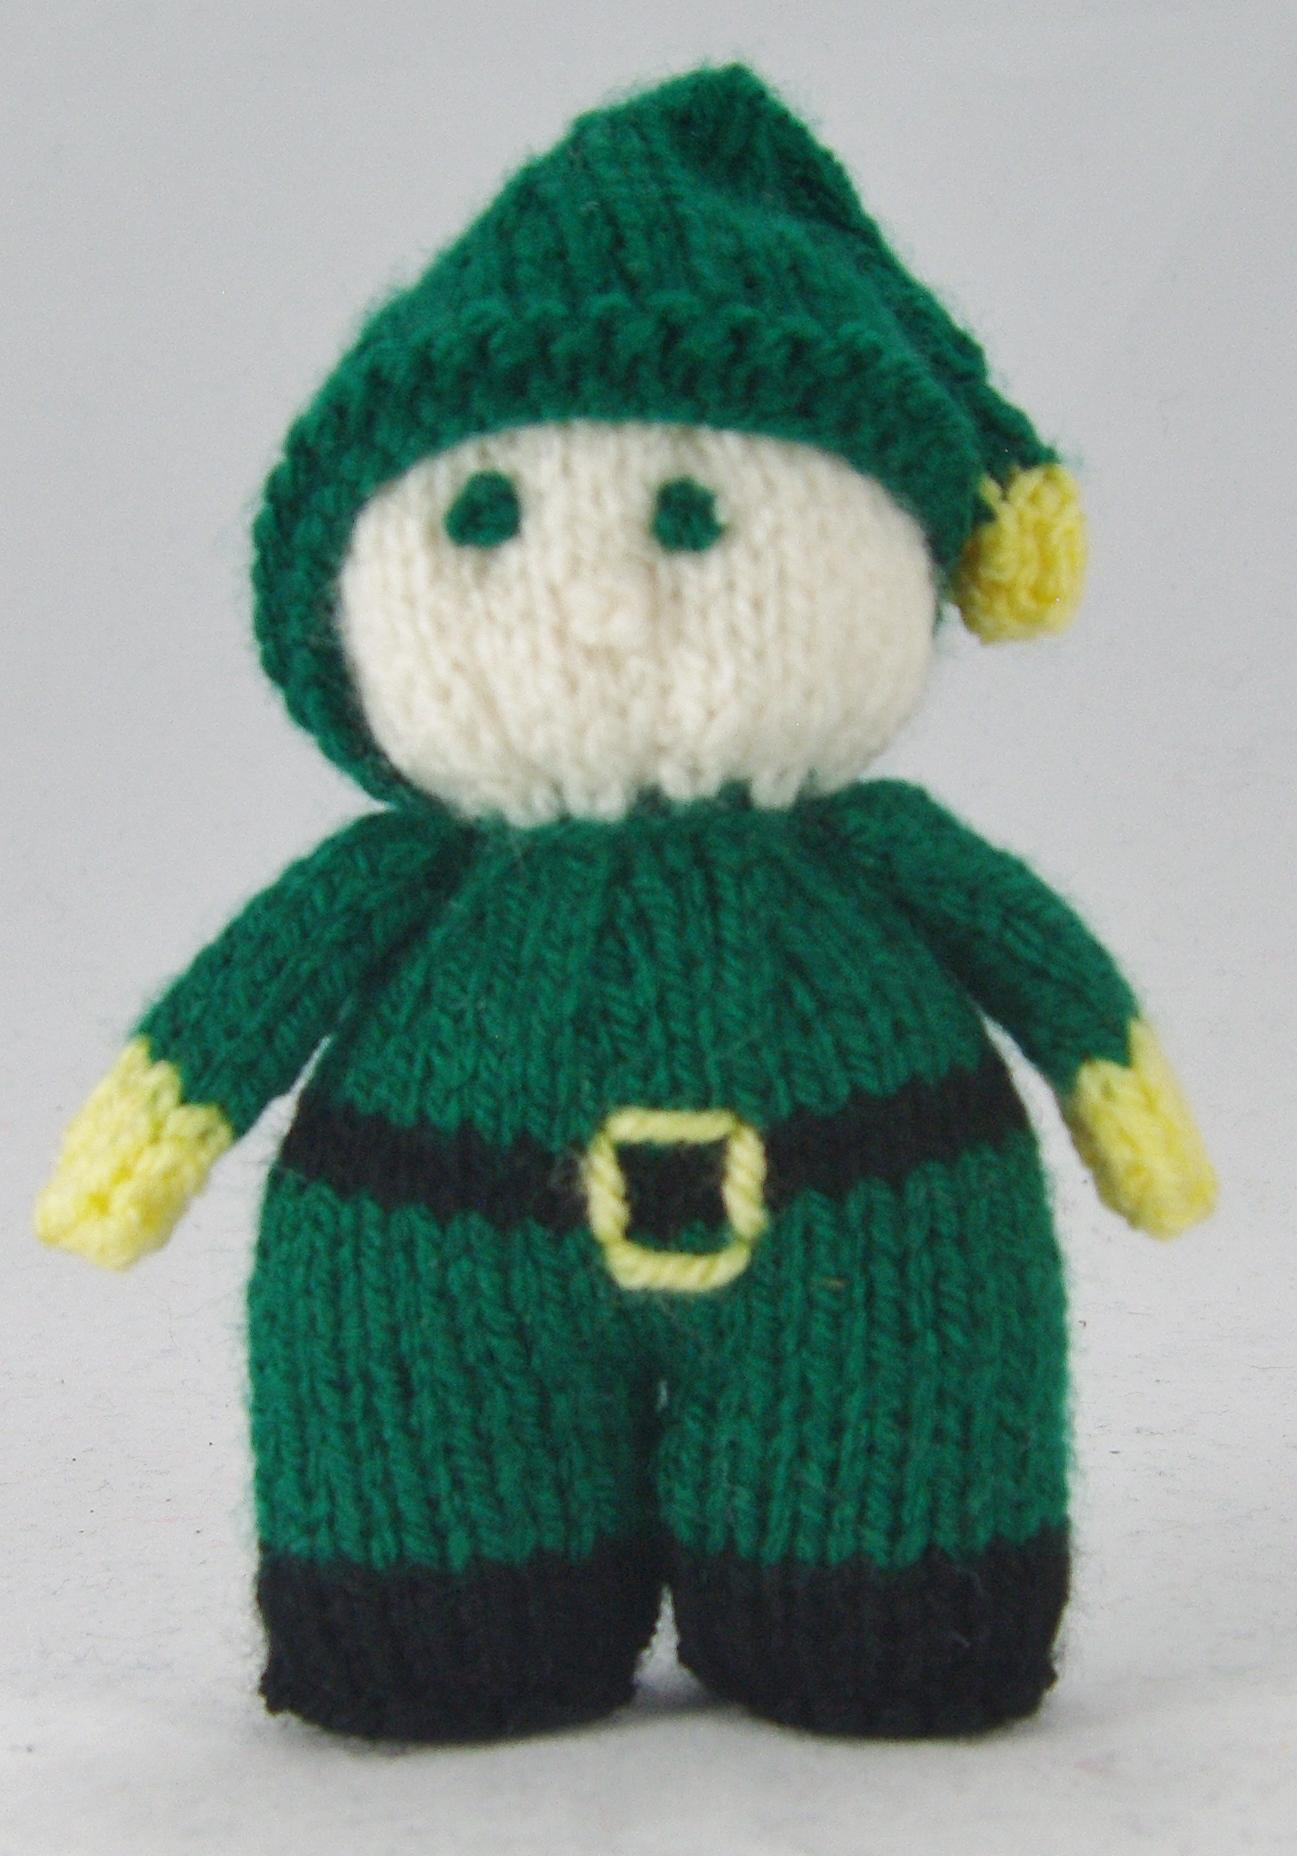 Mini Knitted Christmas Characters Knitting Pattern ...